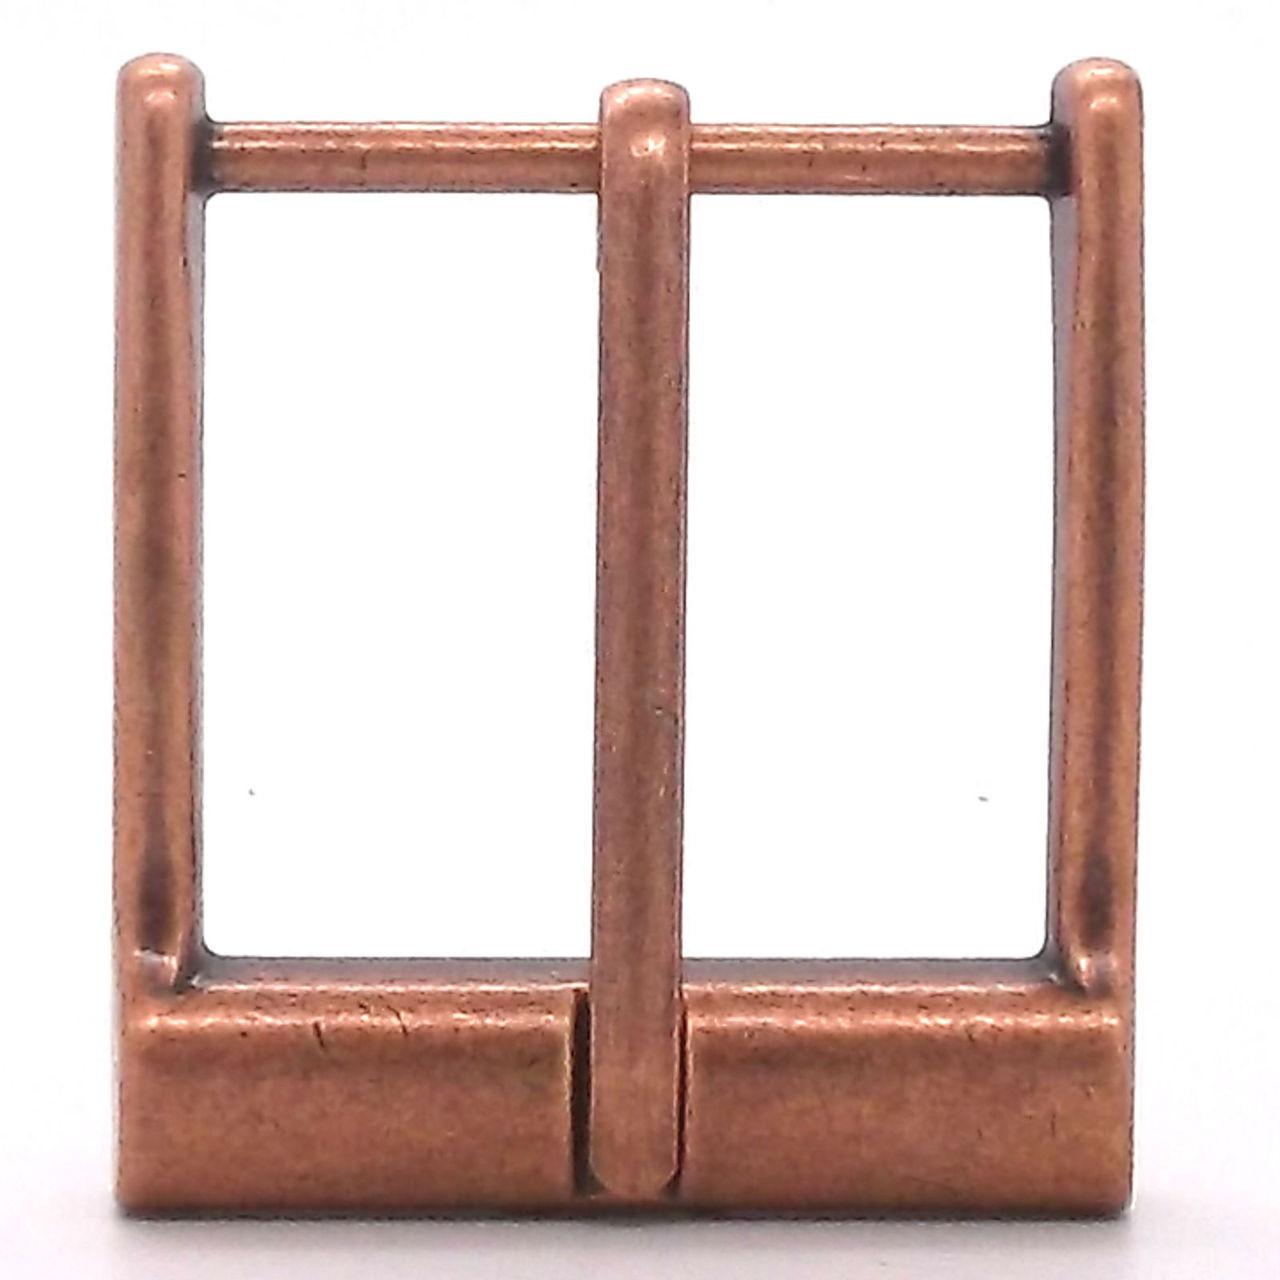 "Napa  Roller Belt Buckle Copper 1-1//2/"" 1643-10 by Stecksstore"